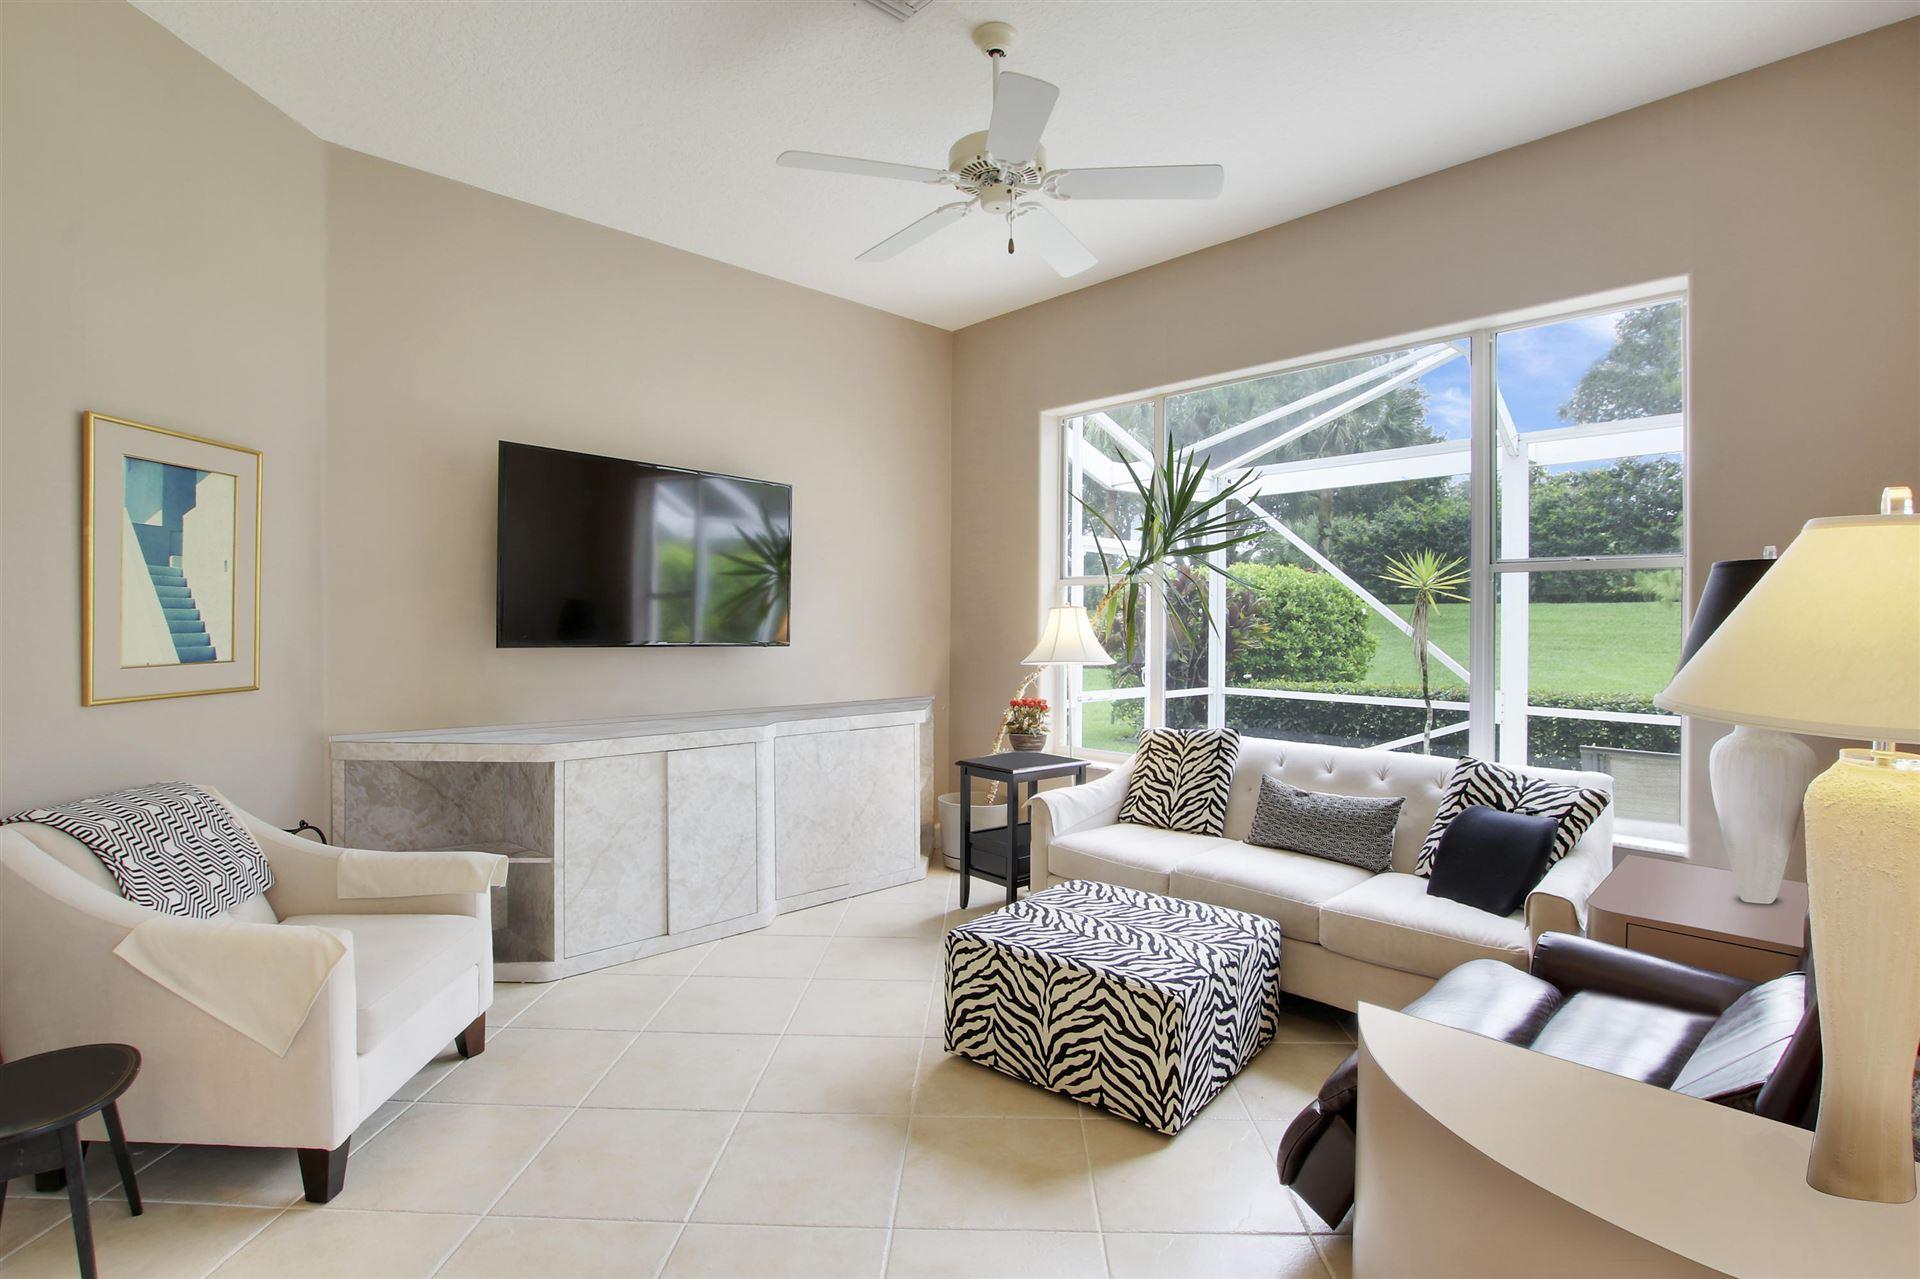 Photo of 727 Pinehurst Way, Palm Beach Gardens, FL 33418 (MLS # RX-10631864)